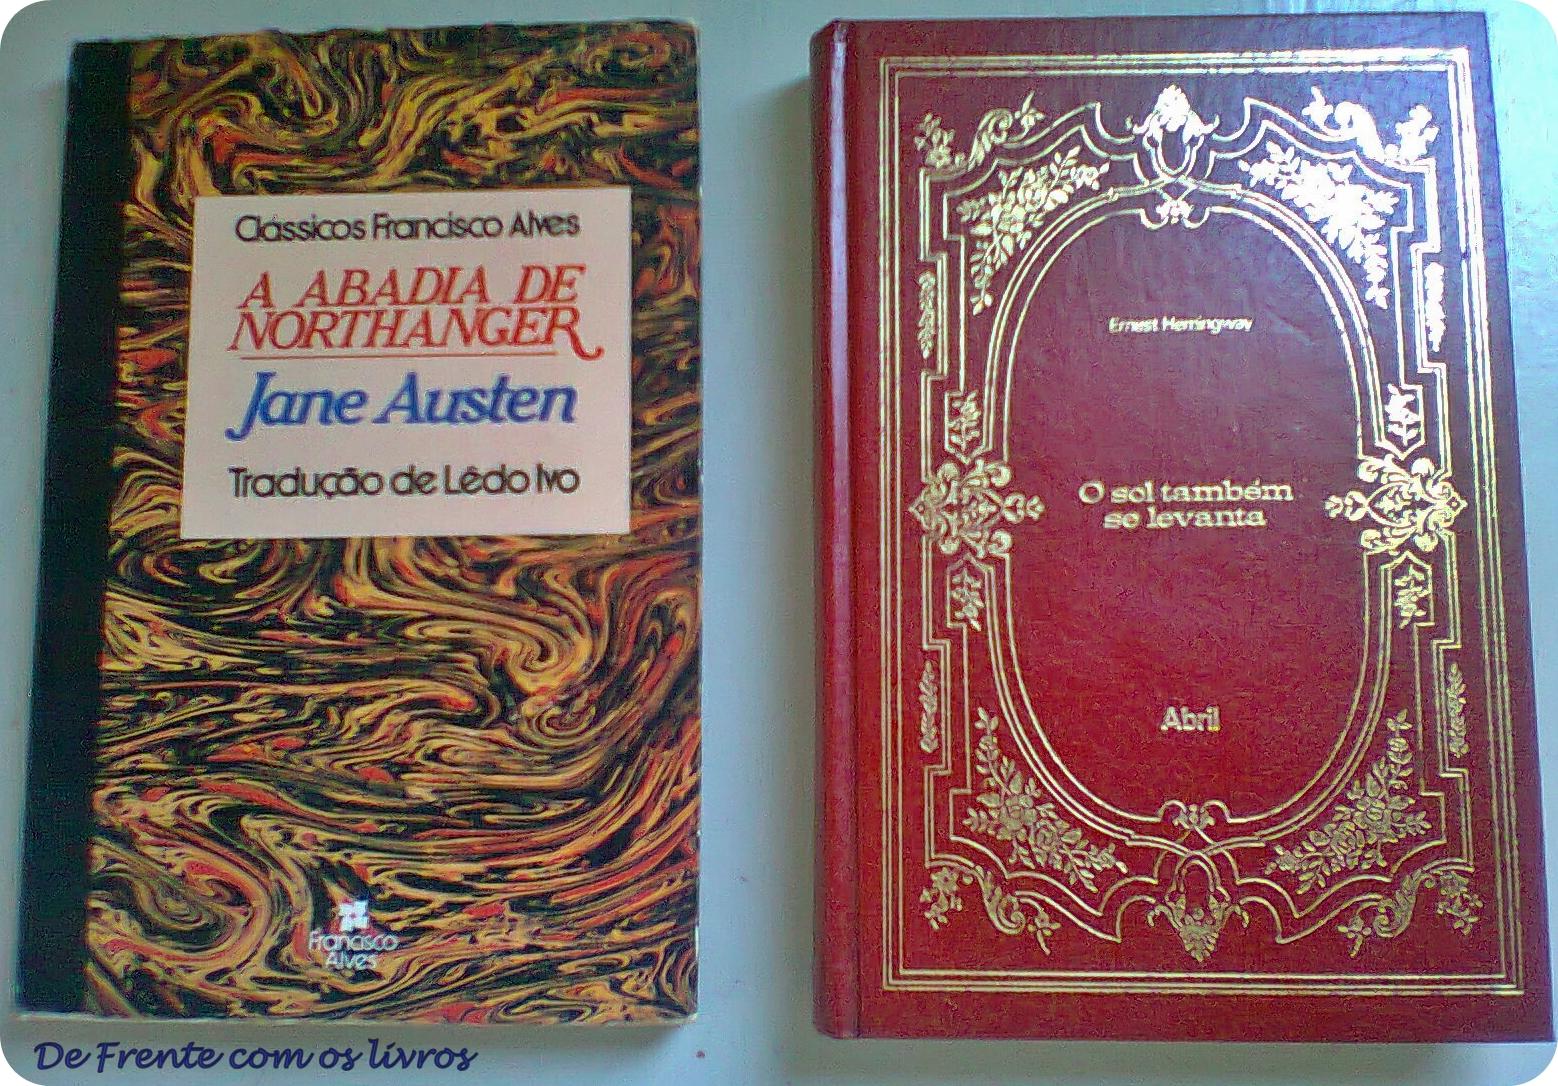 Jane Austen e Ernest Hemingway